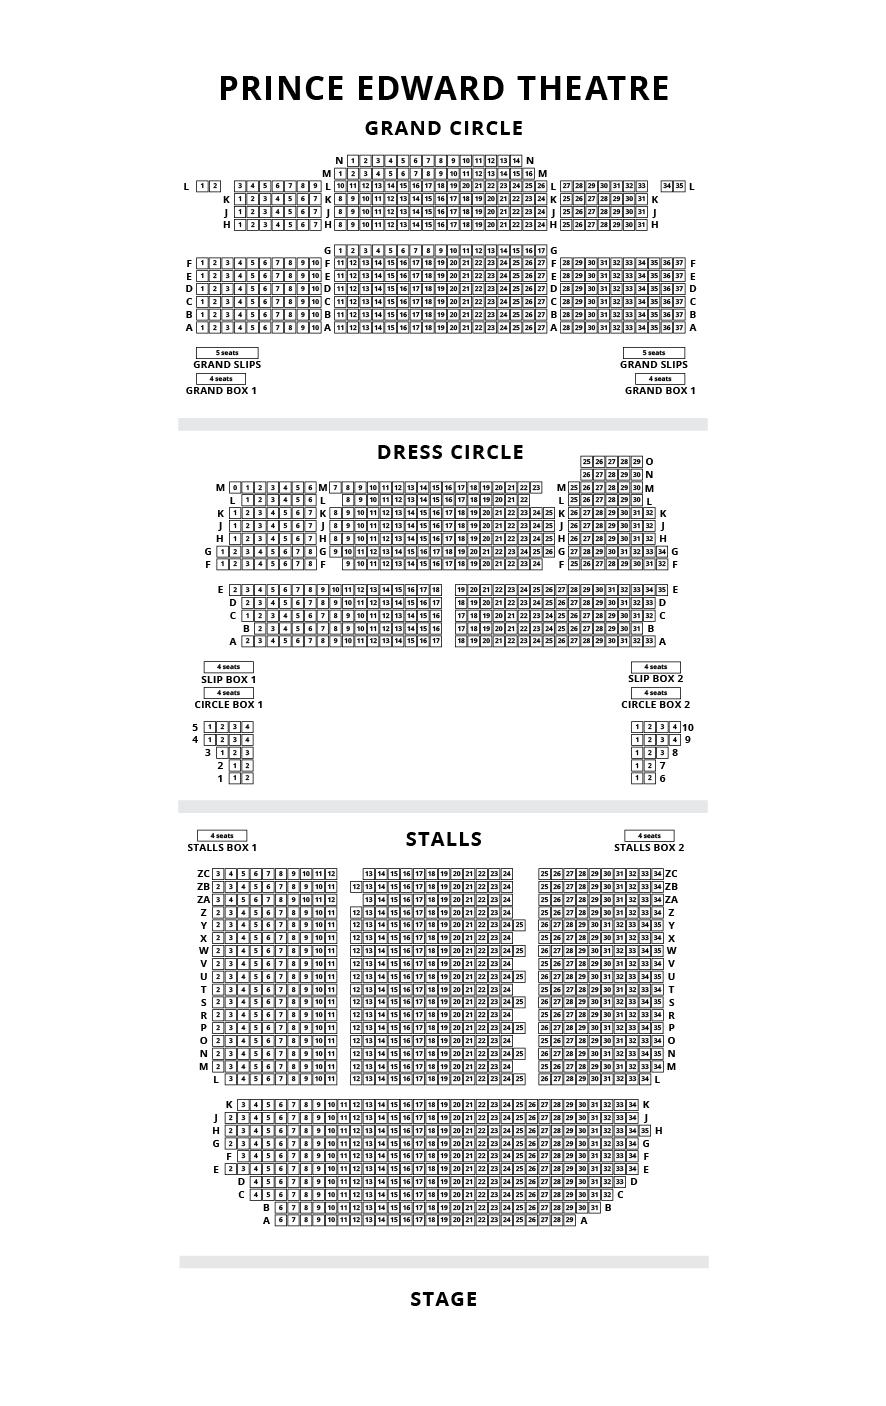 Prince Edward Theatre seating plan